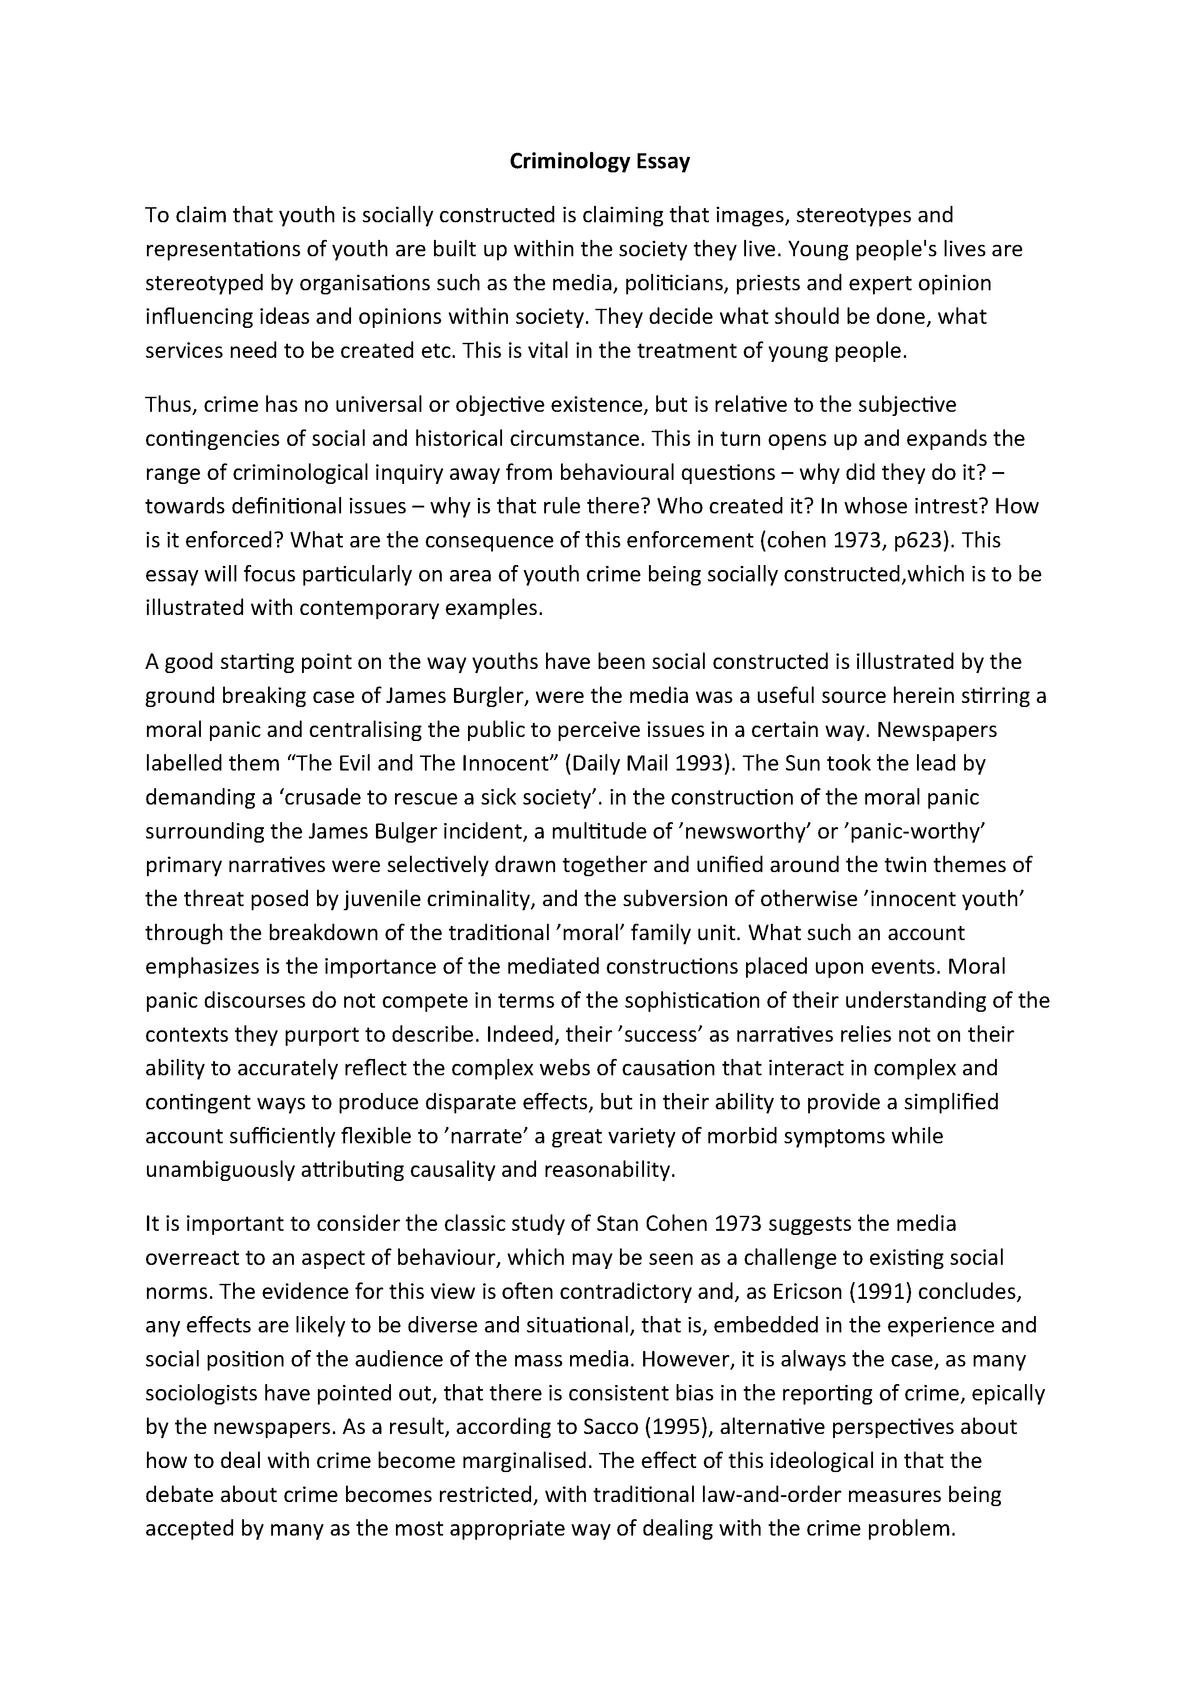 Free Criminology Essay Samples | Uni Assignment Centre